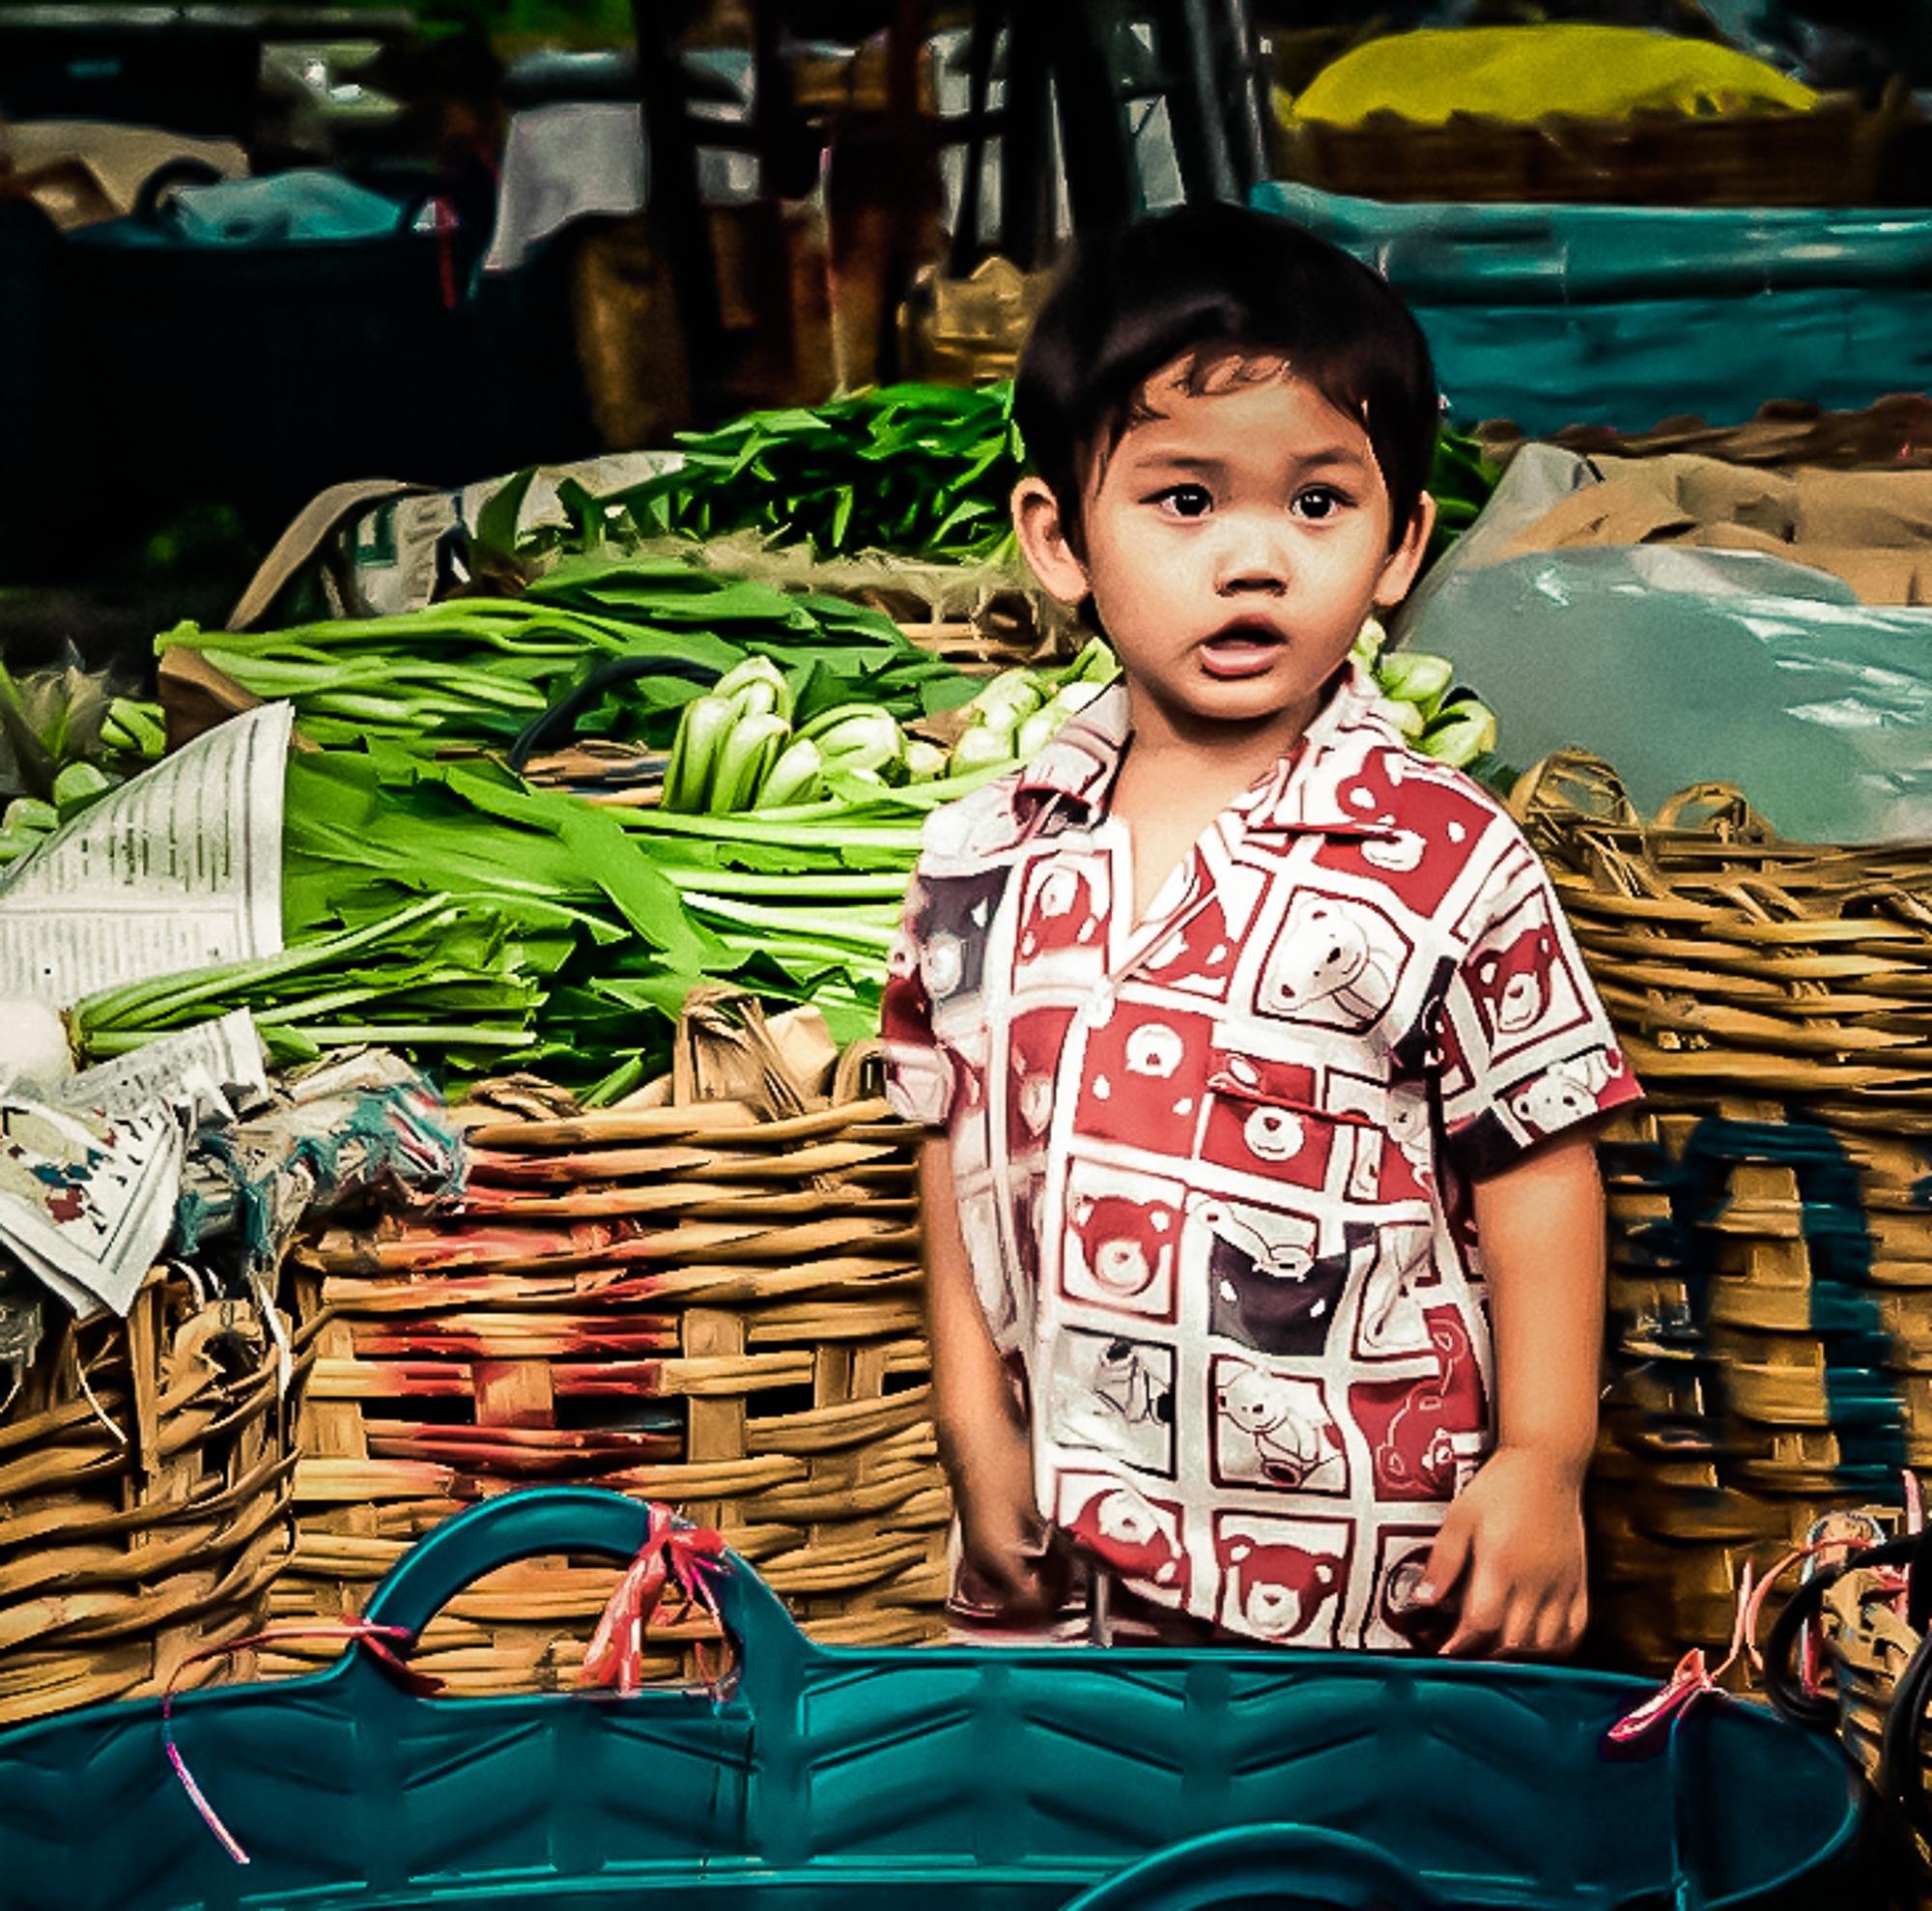 58148A - Bangkok Market Boy